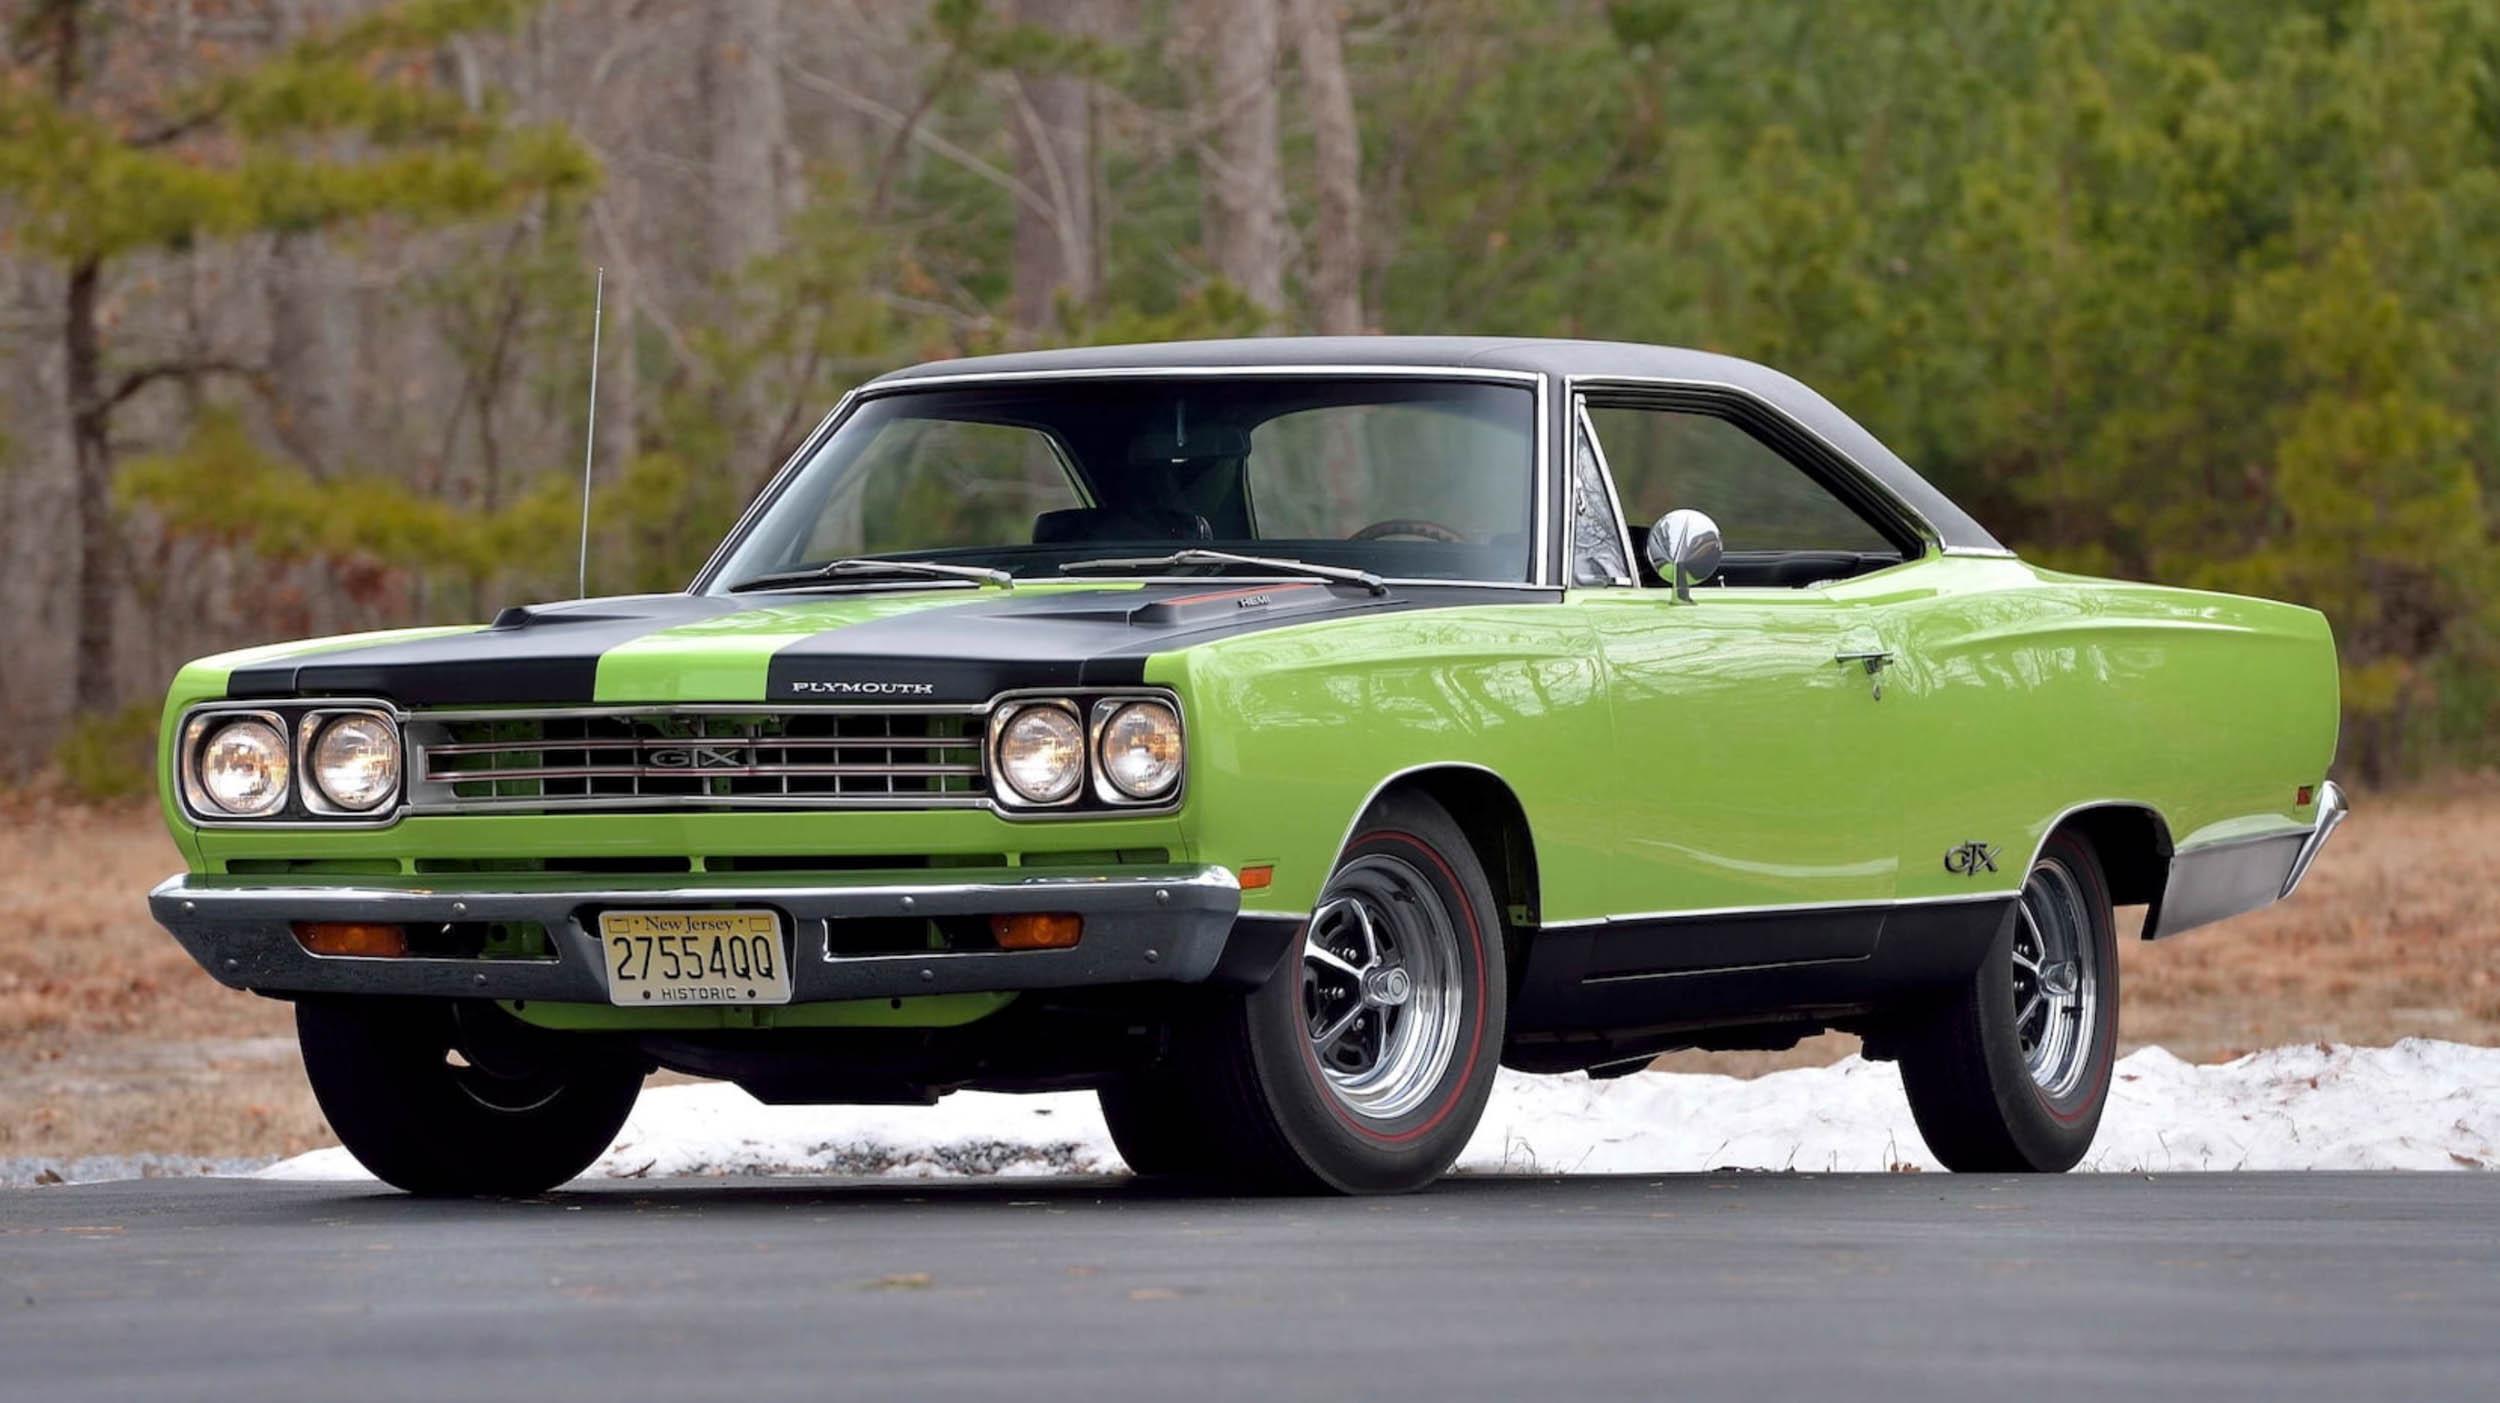 1970 Plymouth GTX Hemi